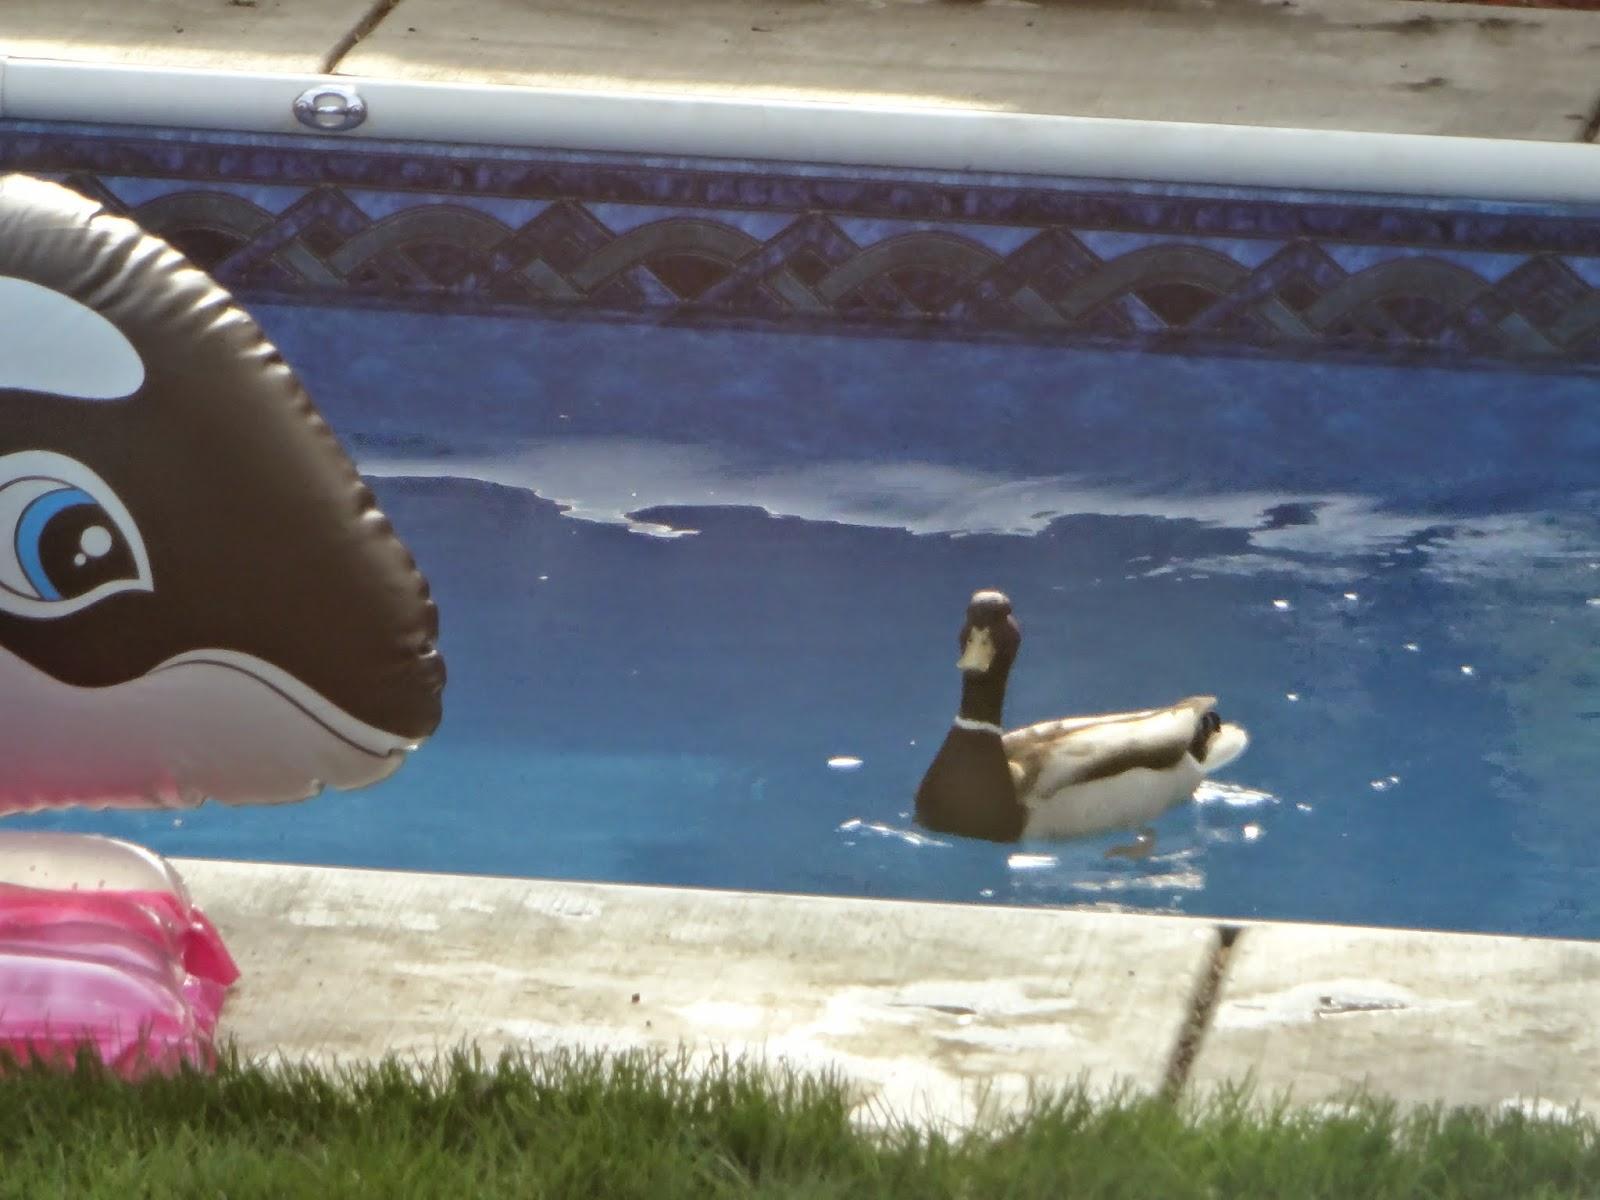 Sustainable mycology salt water pool maintenance - Saltwater swimming pool maintenance ...